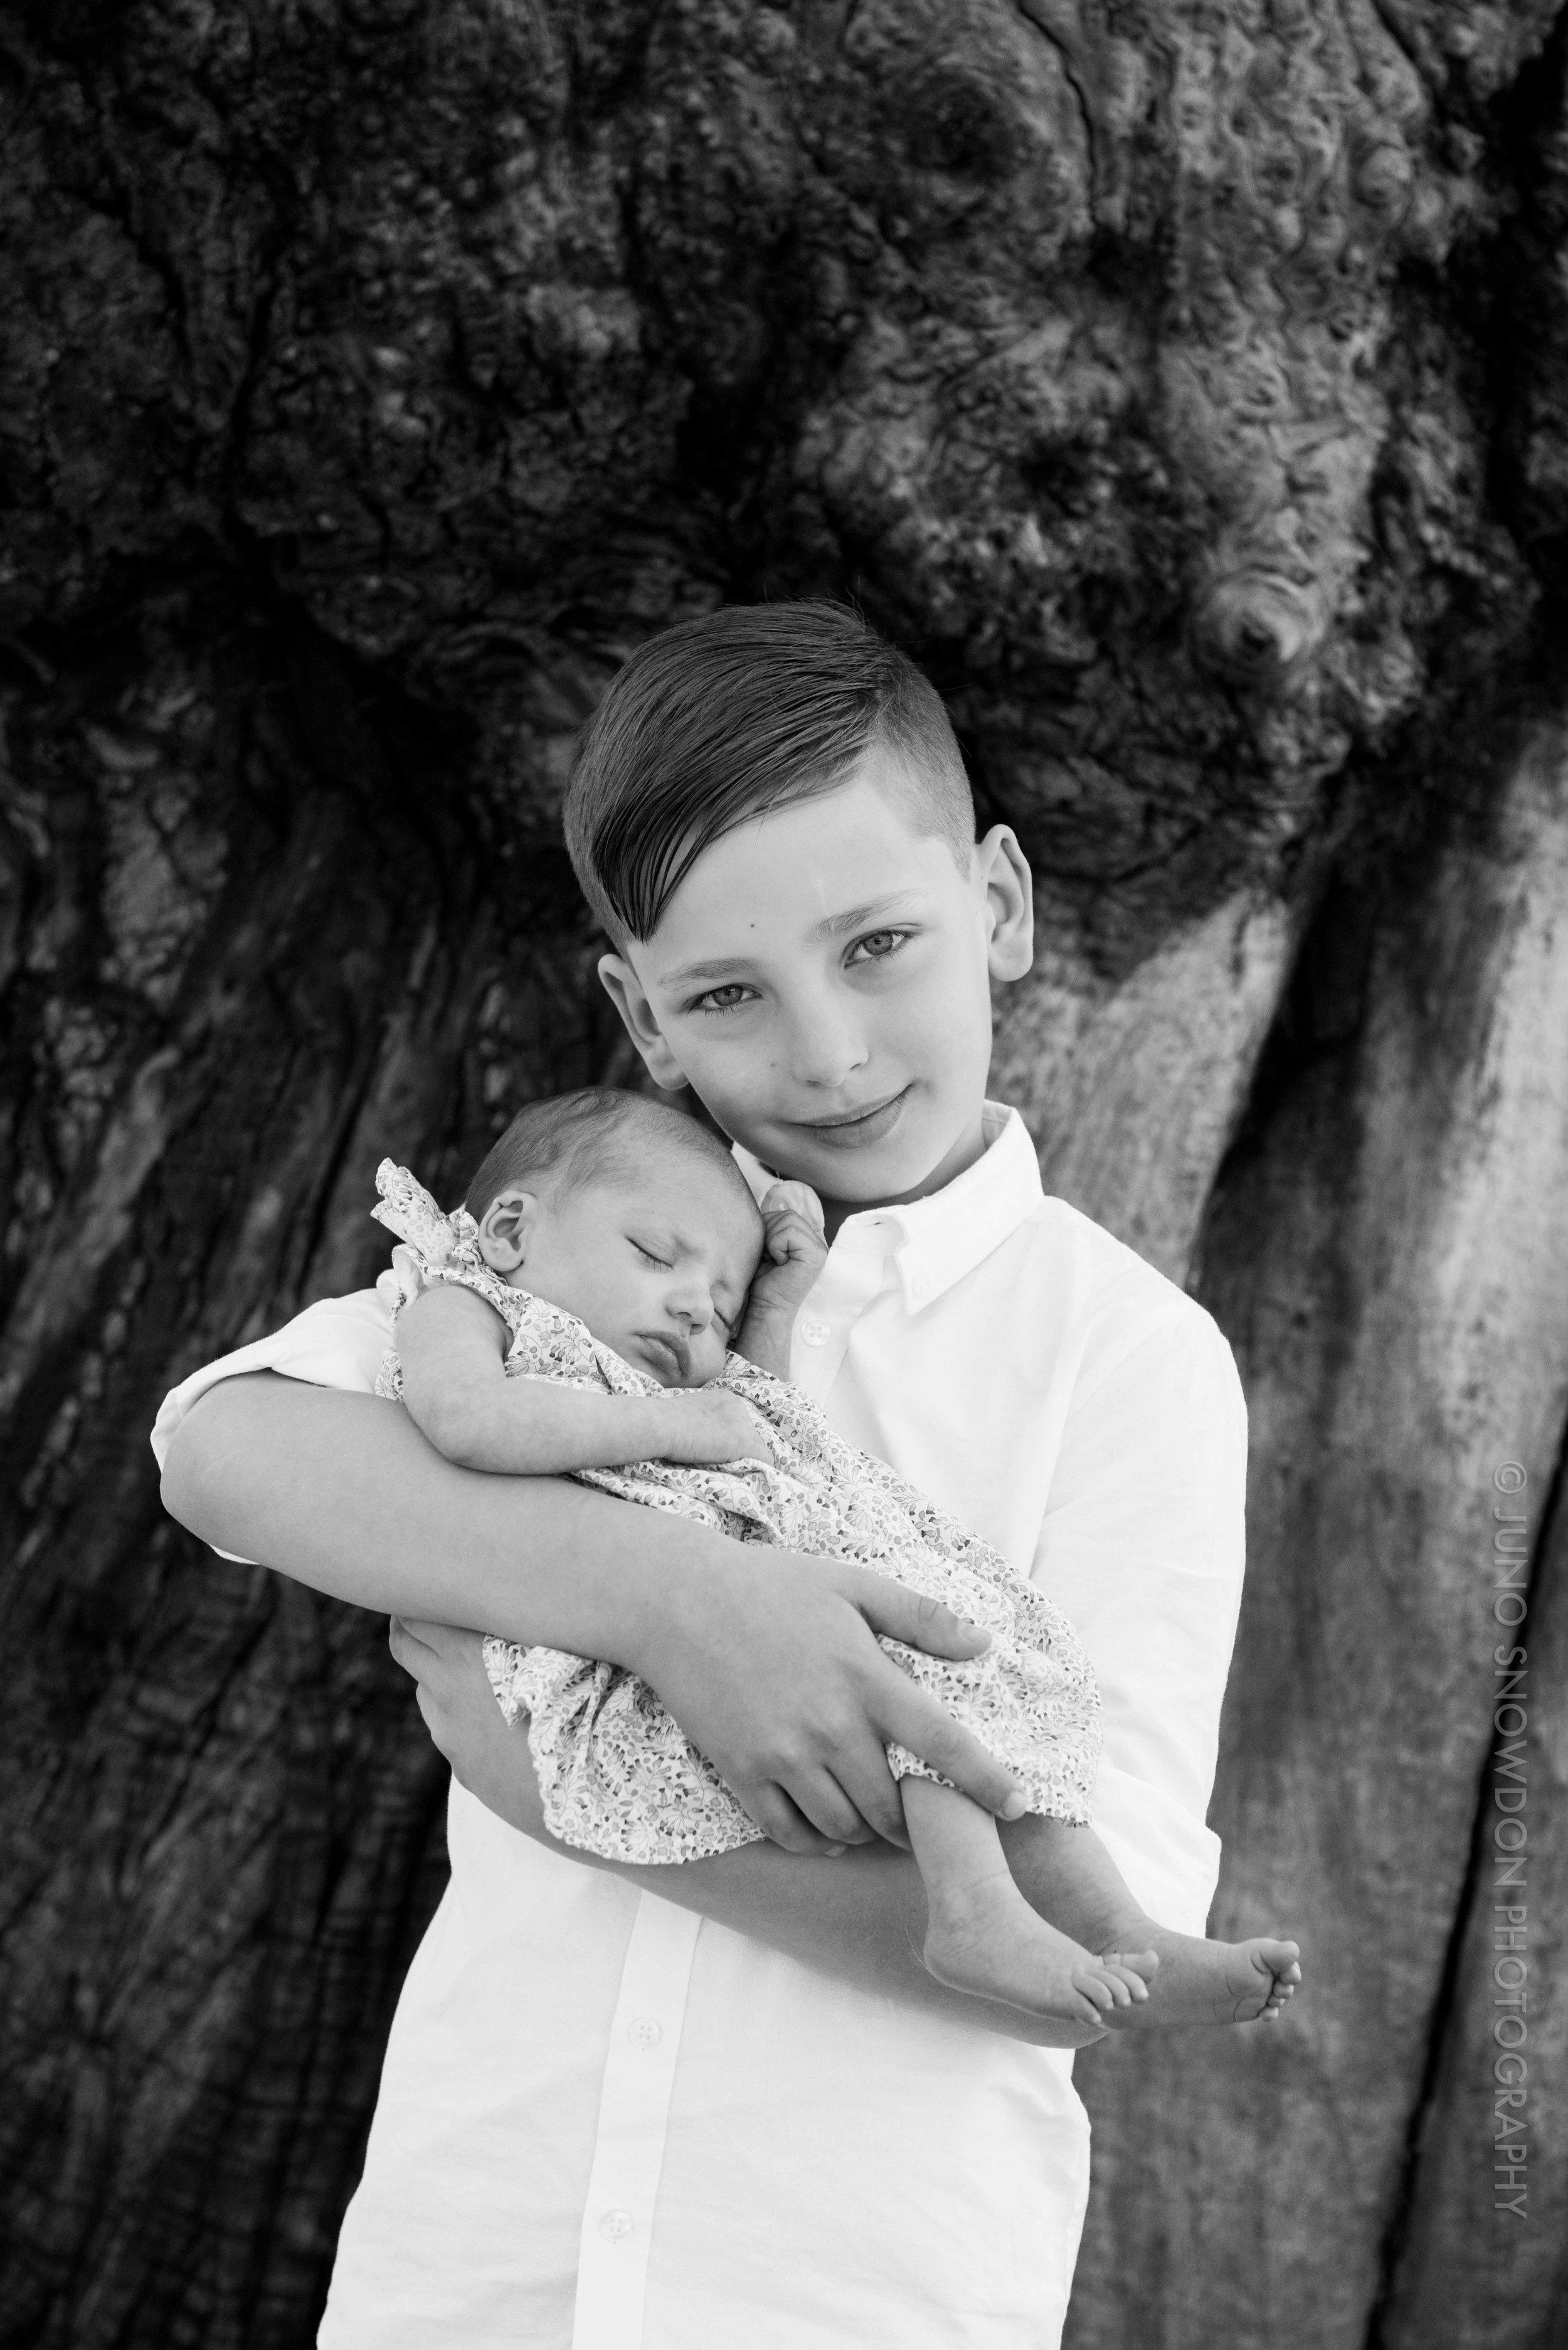 juno-snowdon-photography-newborn-5917.jpg